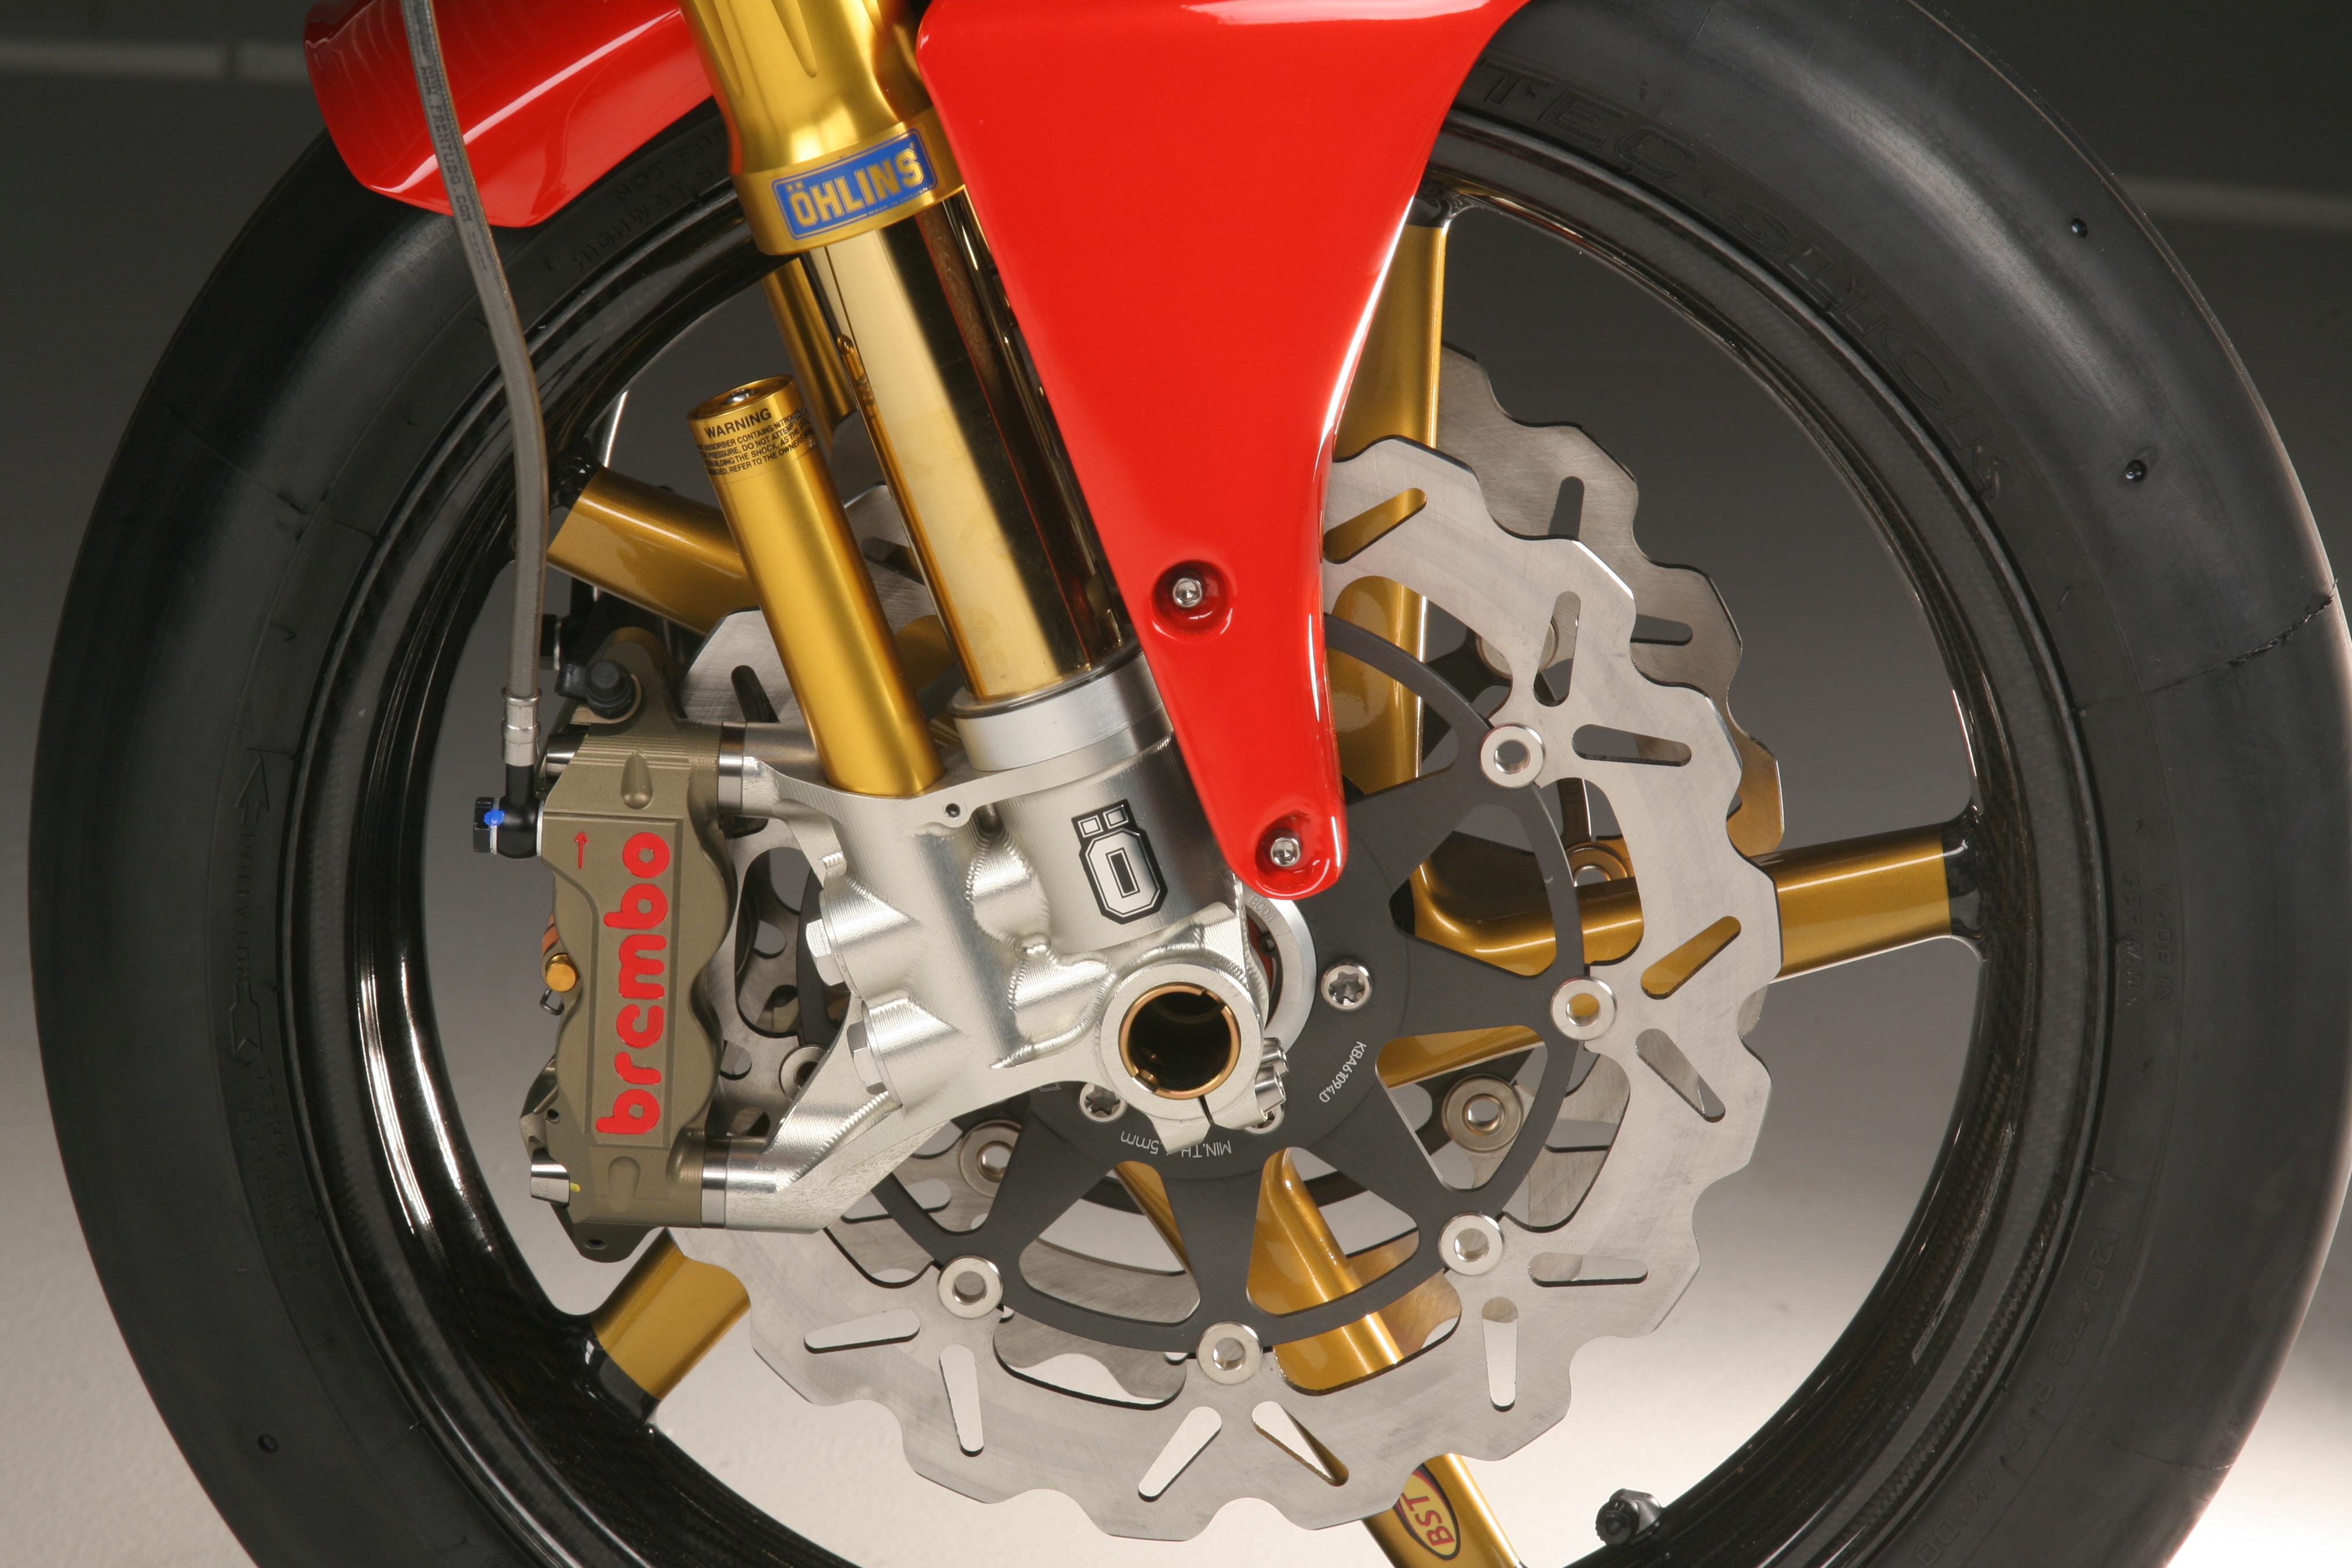 Suzuki Gsxr 600 >> Parts :: Ducati :: 848 / 1098 / 1198 :: Suspension ...